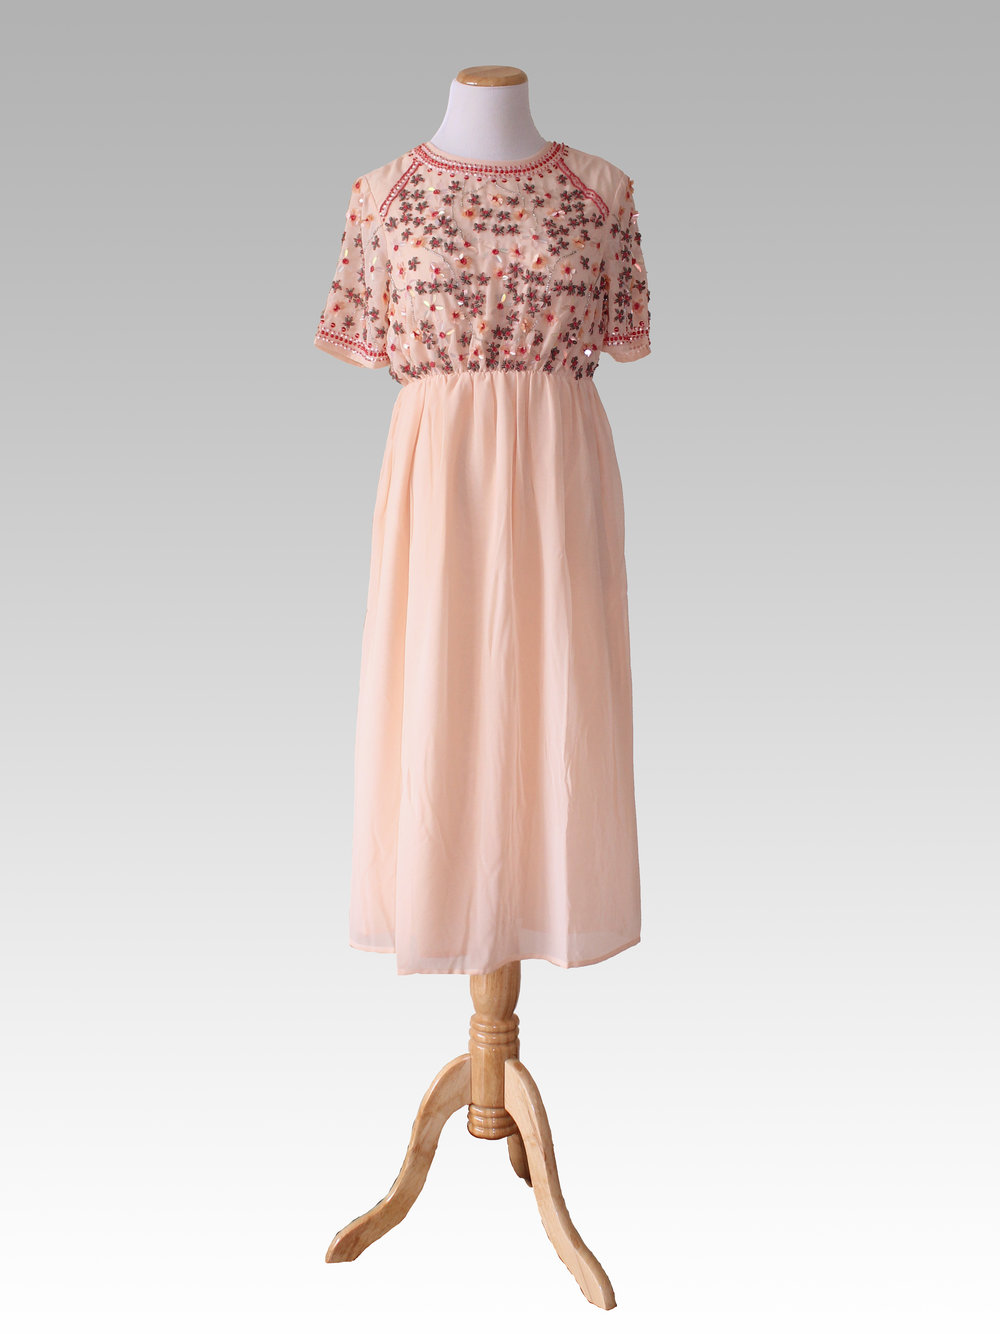 pink-flowers-midi-dress-front.jpg